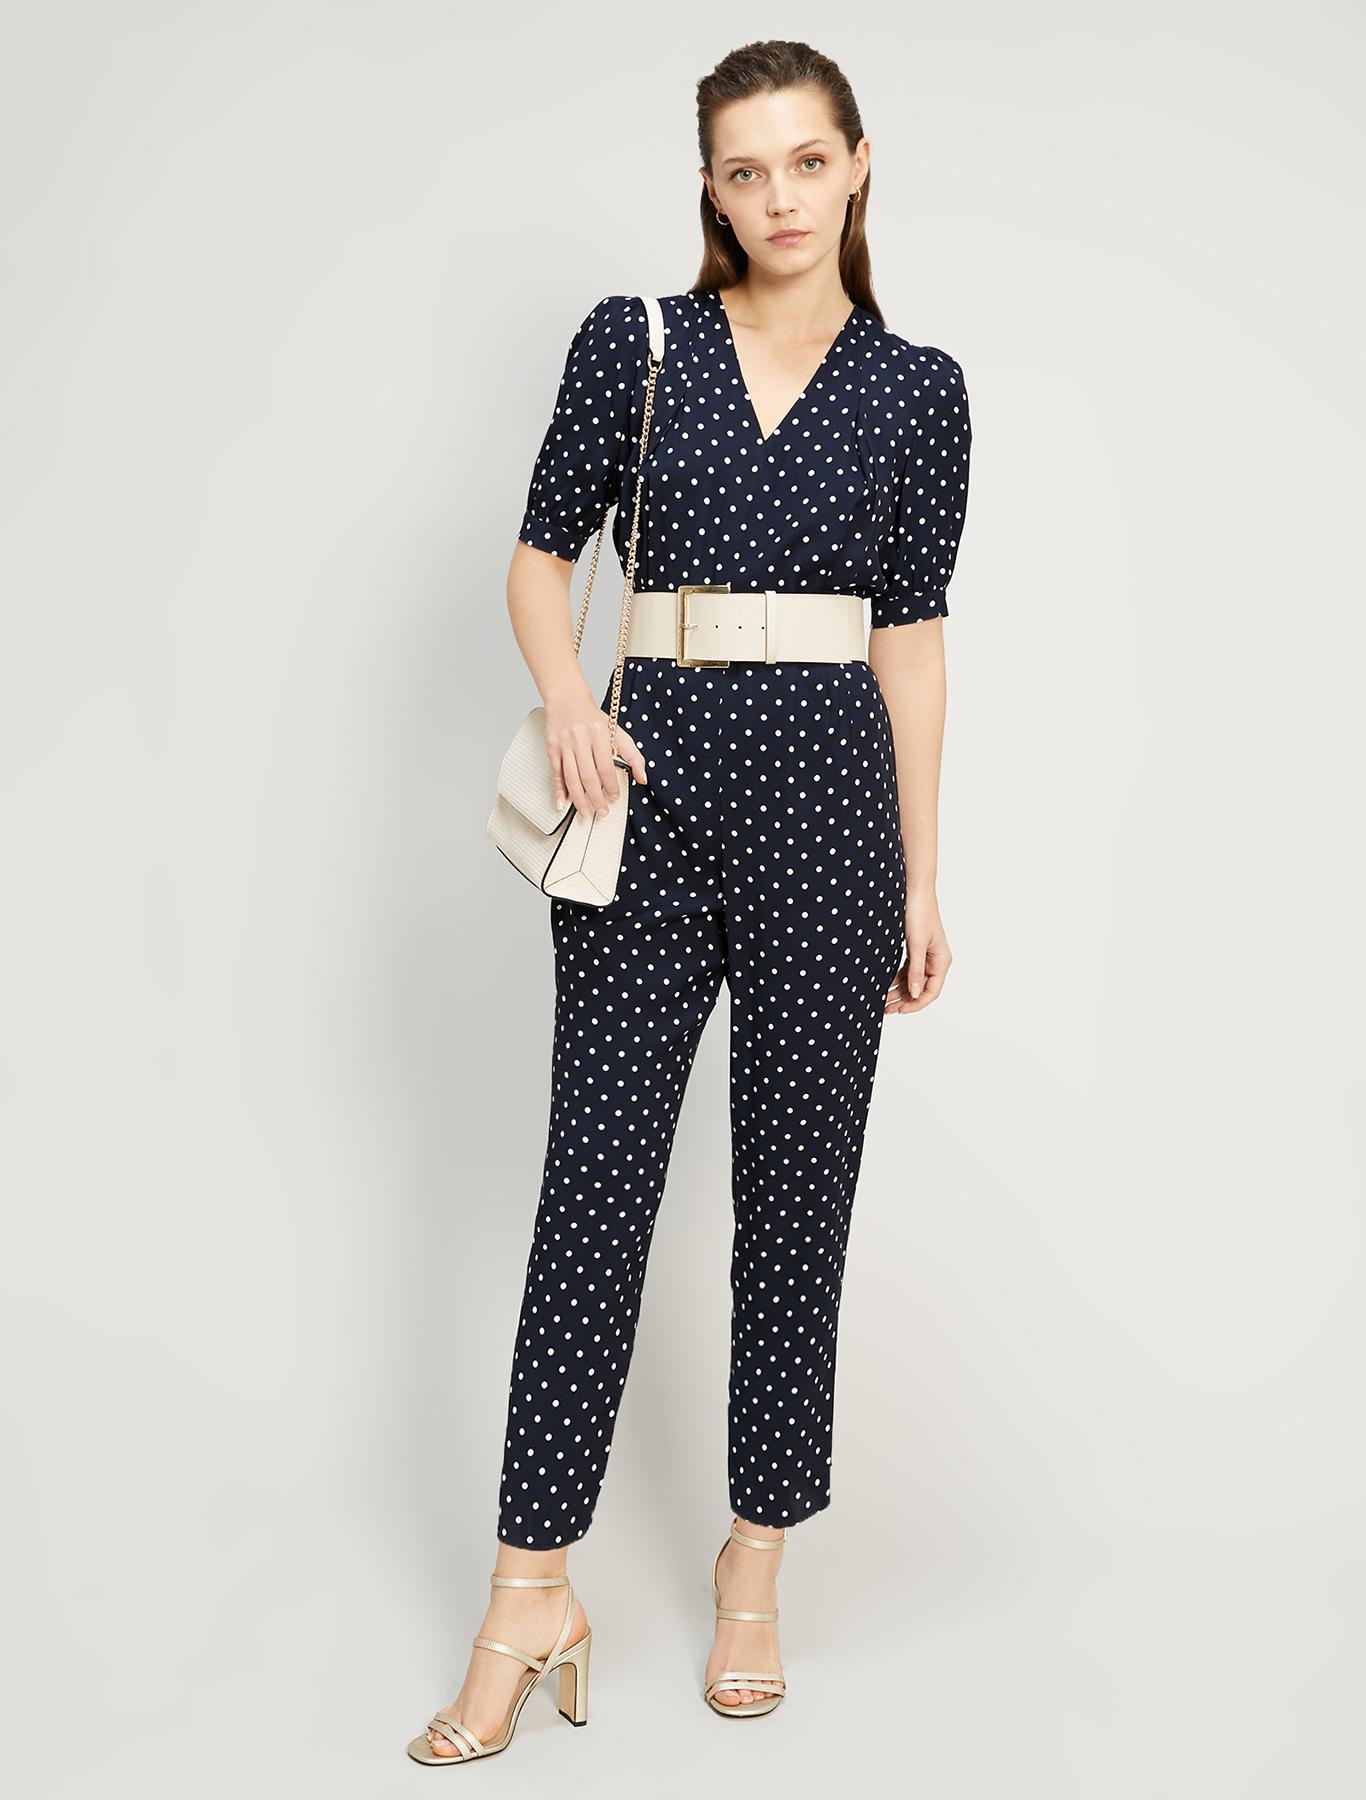 Polka dot sablé jumpsuit - navy blue pattern - pennyblack